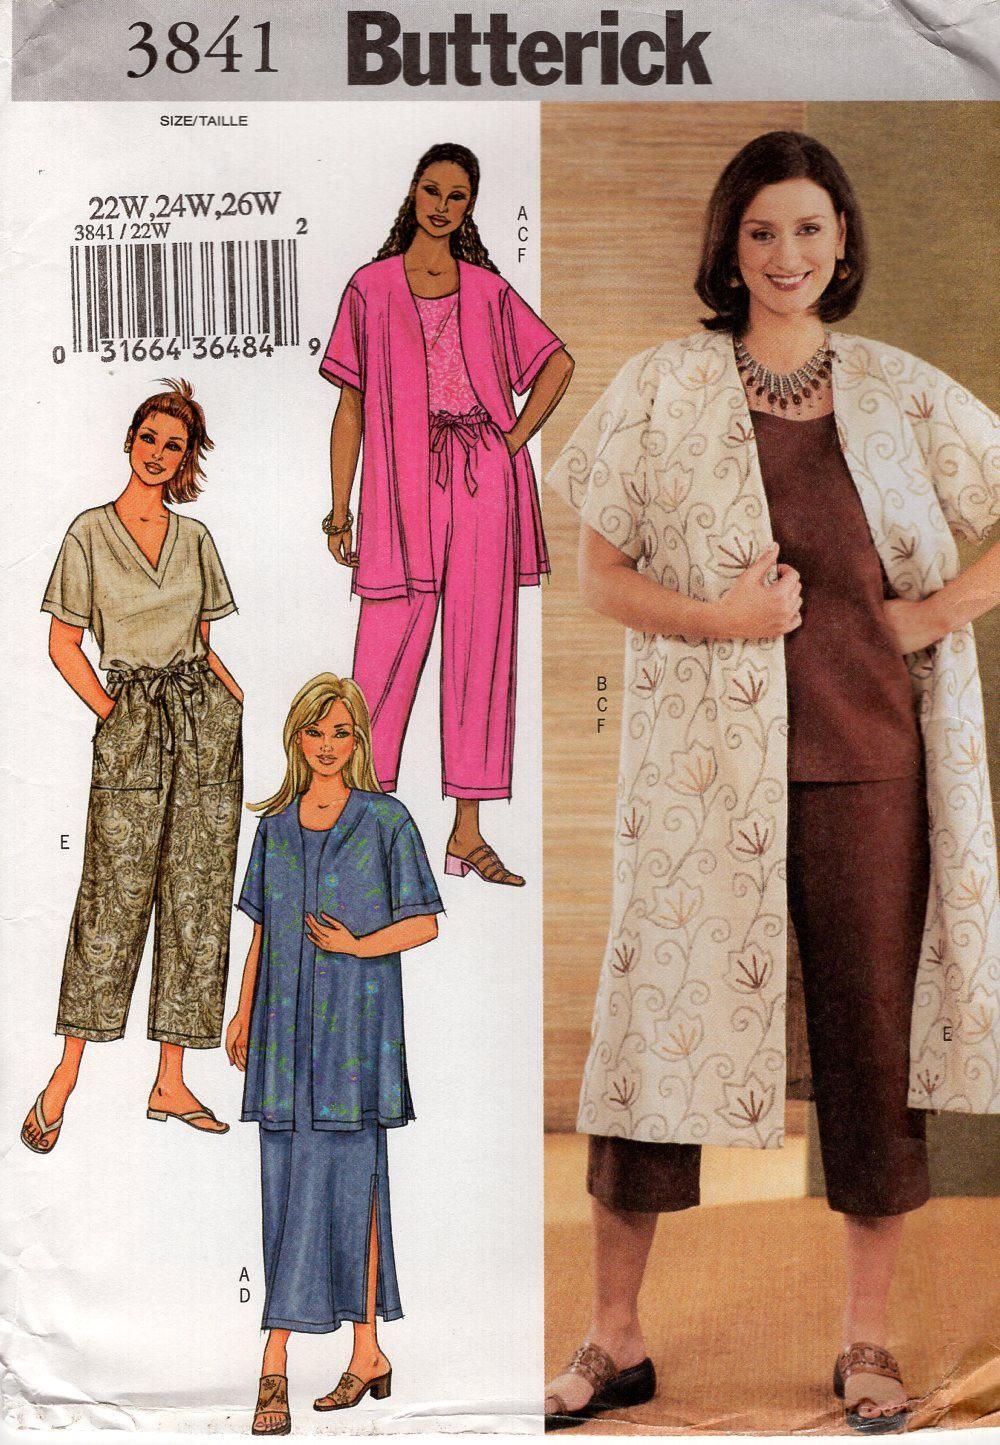 Butterick 3863 sewing pattern free us ship designer chetta b butterick 3841 sewing pattern free us ship womens plus size wardrobe drawstring pants skirt jacket top jeuxipadfo Choice Image